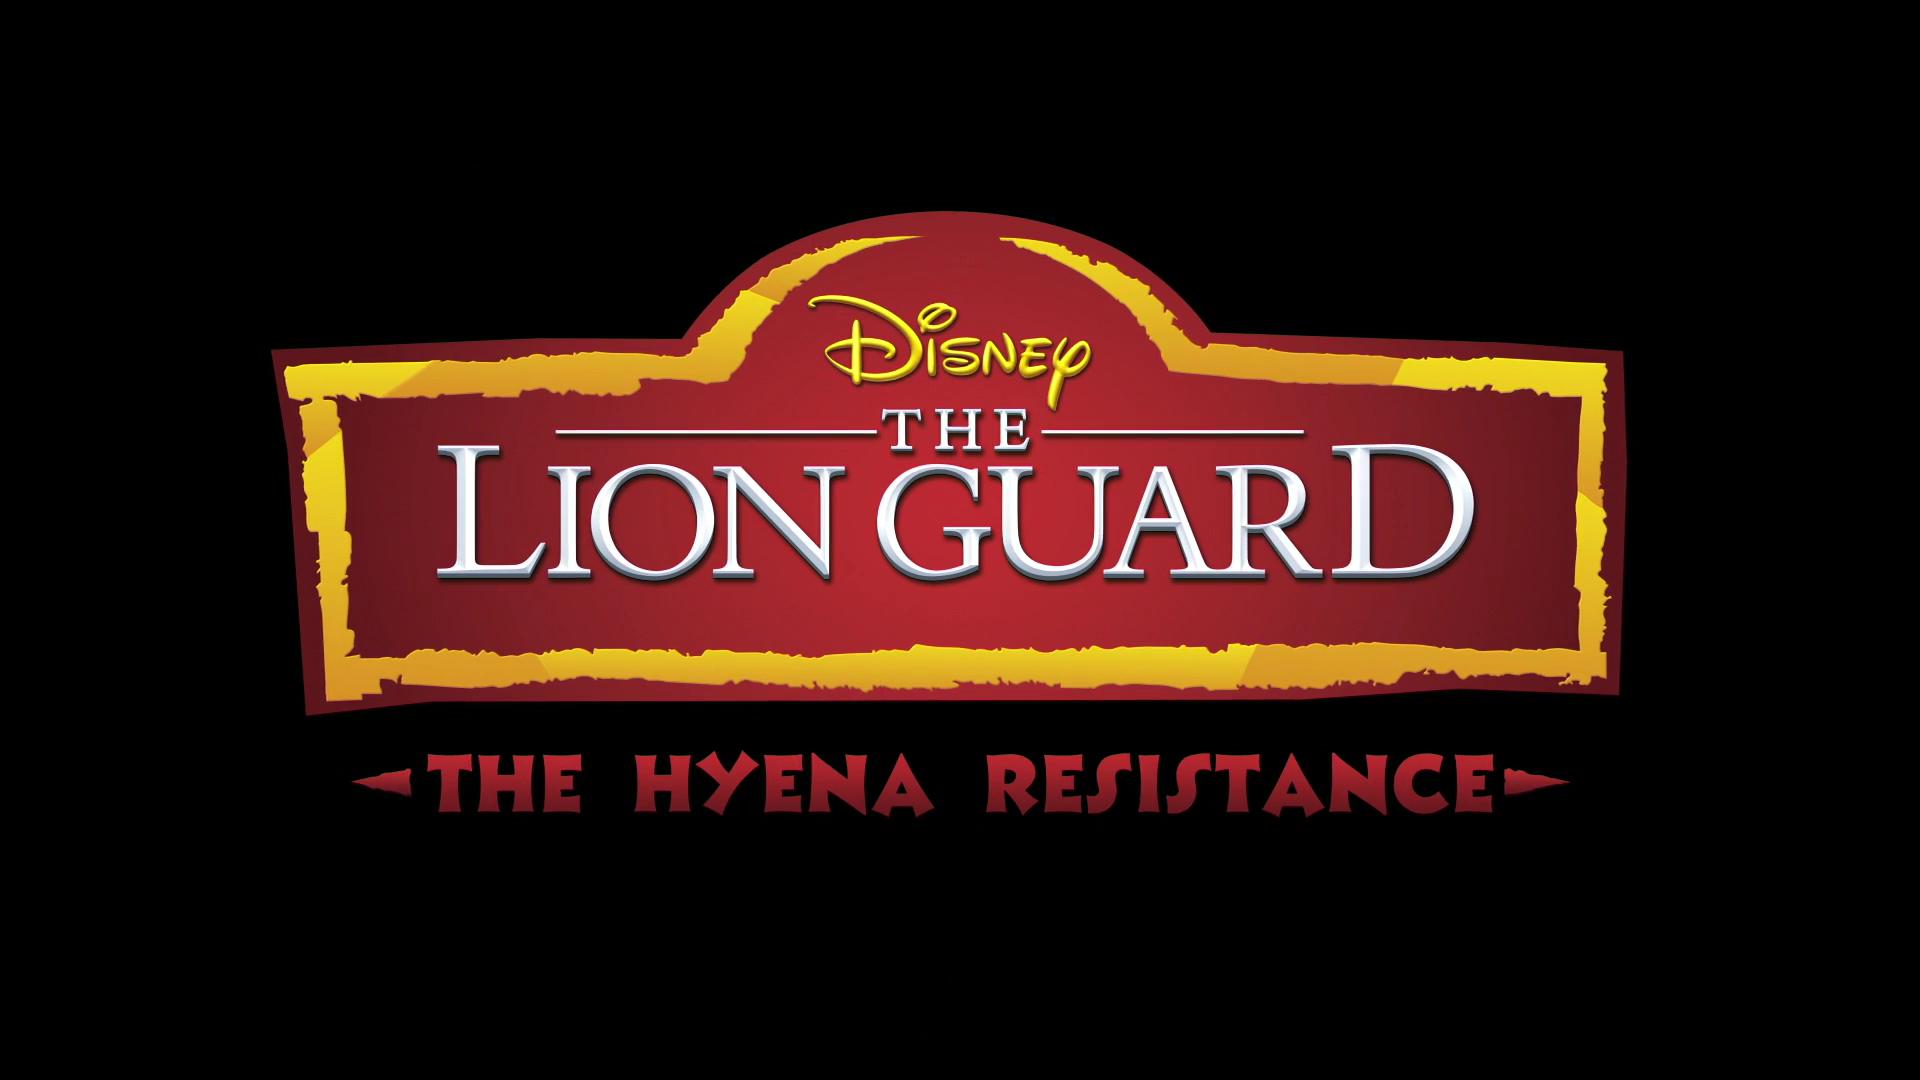 The Hyena Resistance